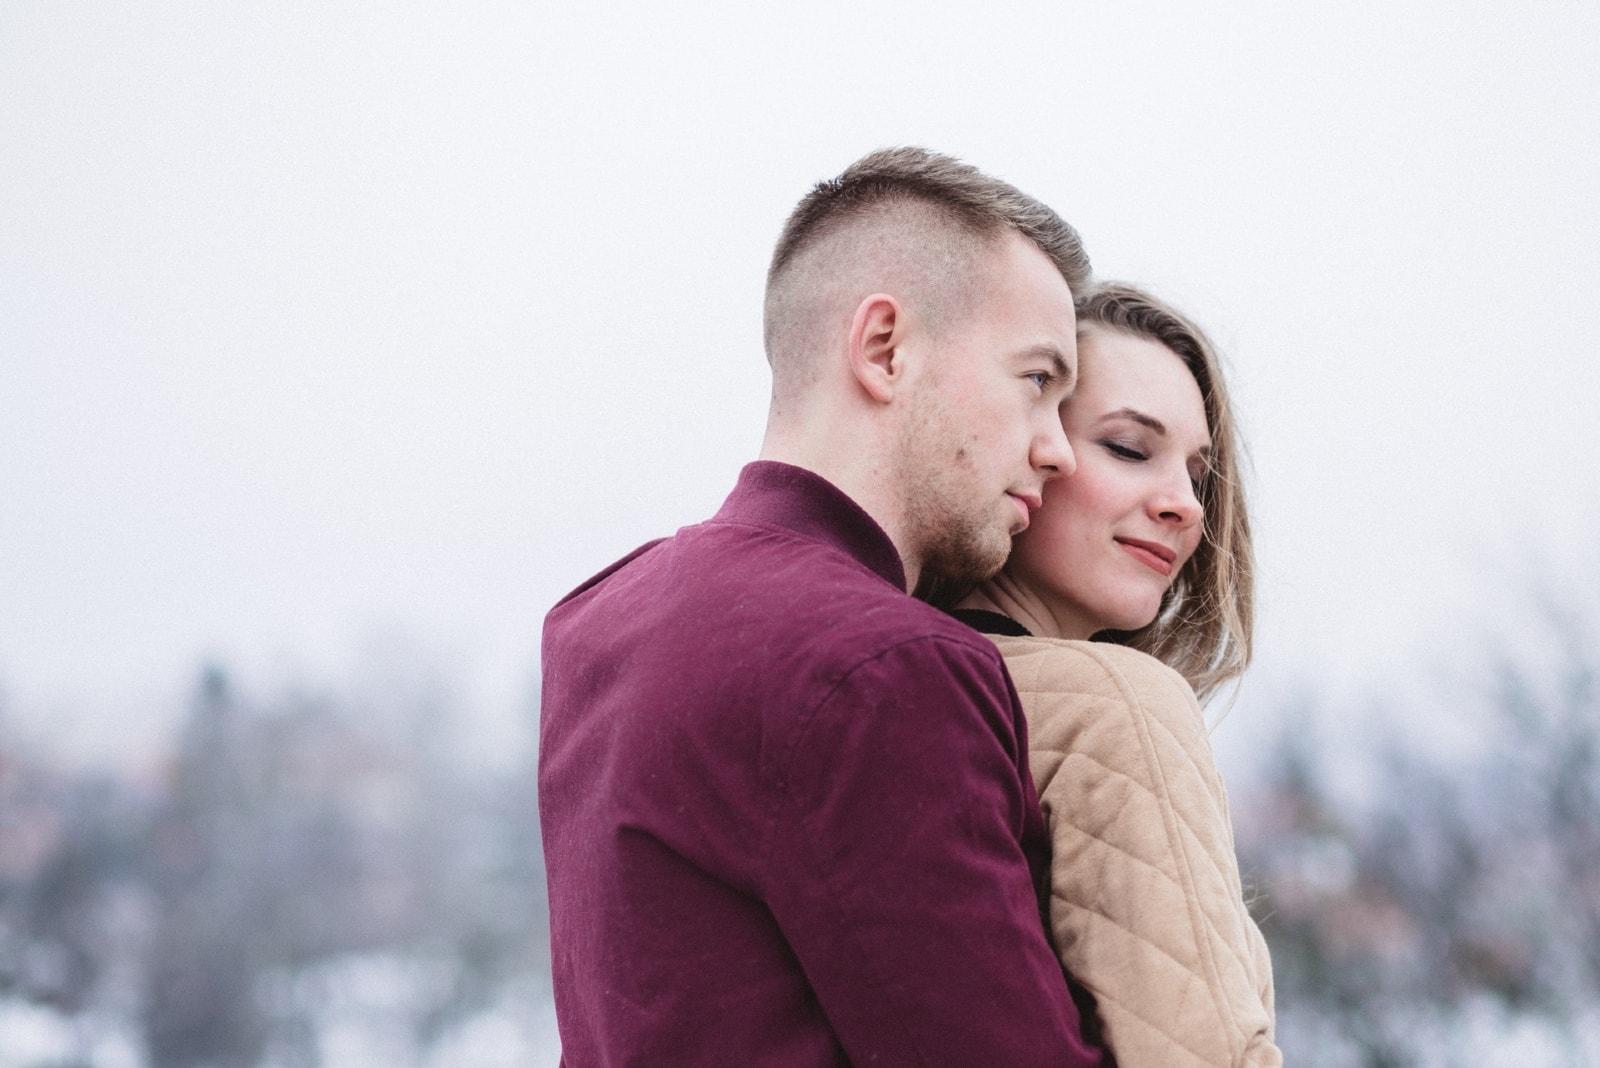 man in burgundy jacket hugging woman outdoor